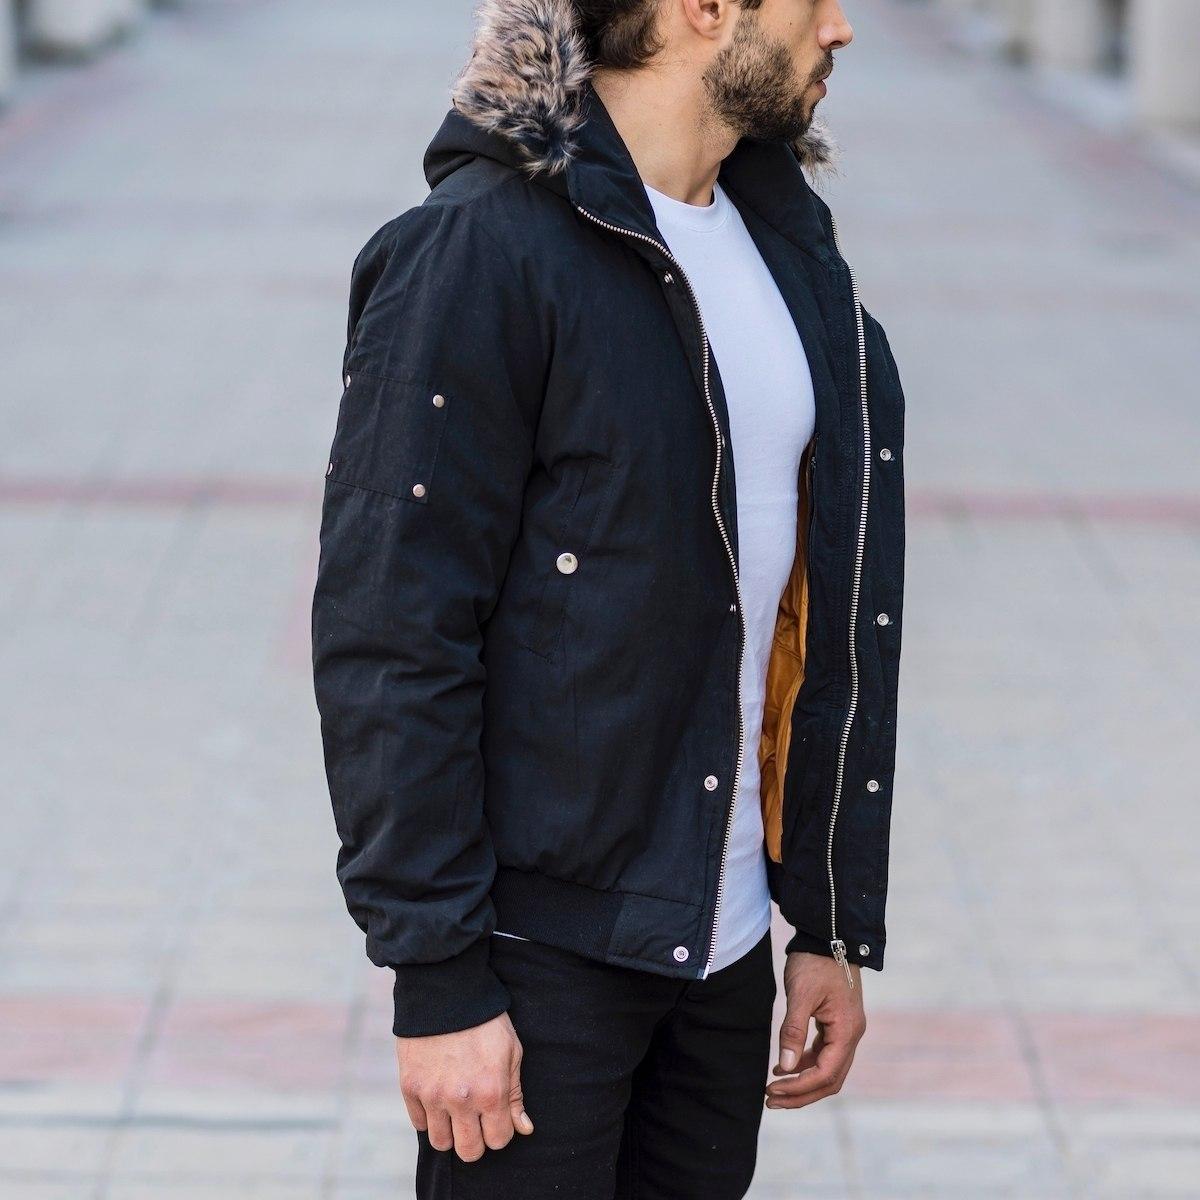 Men's Hooded Furry Jacket...